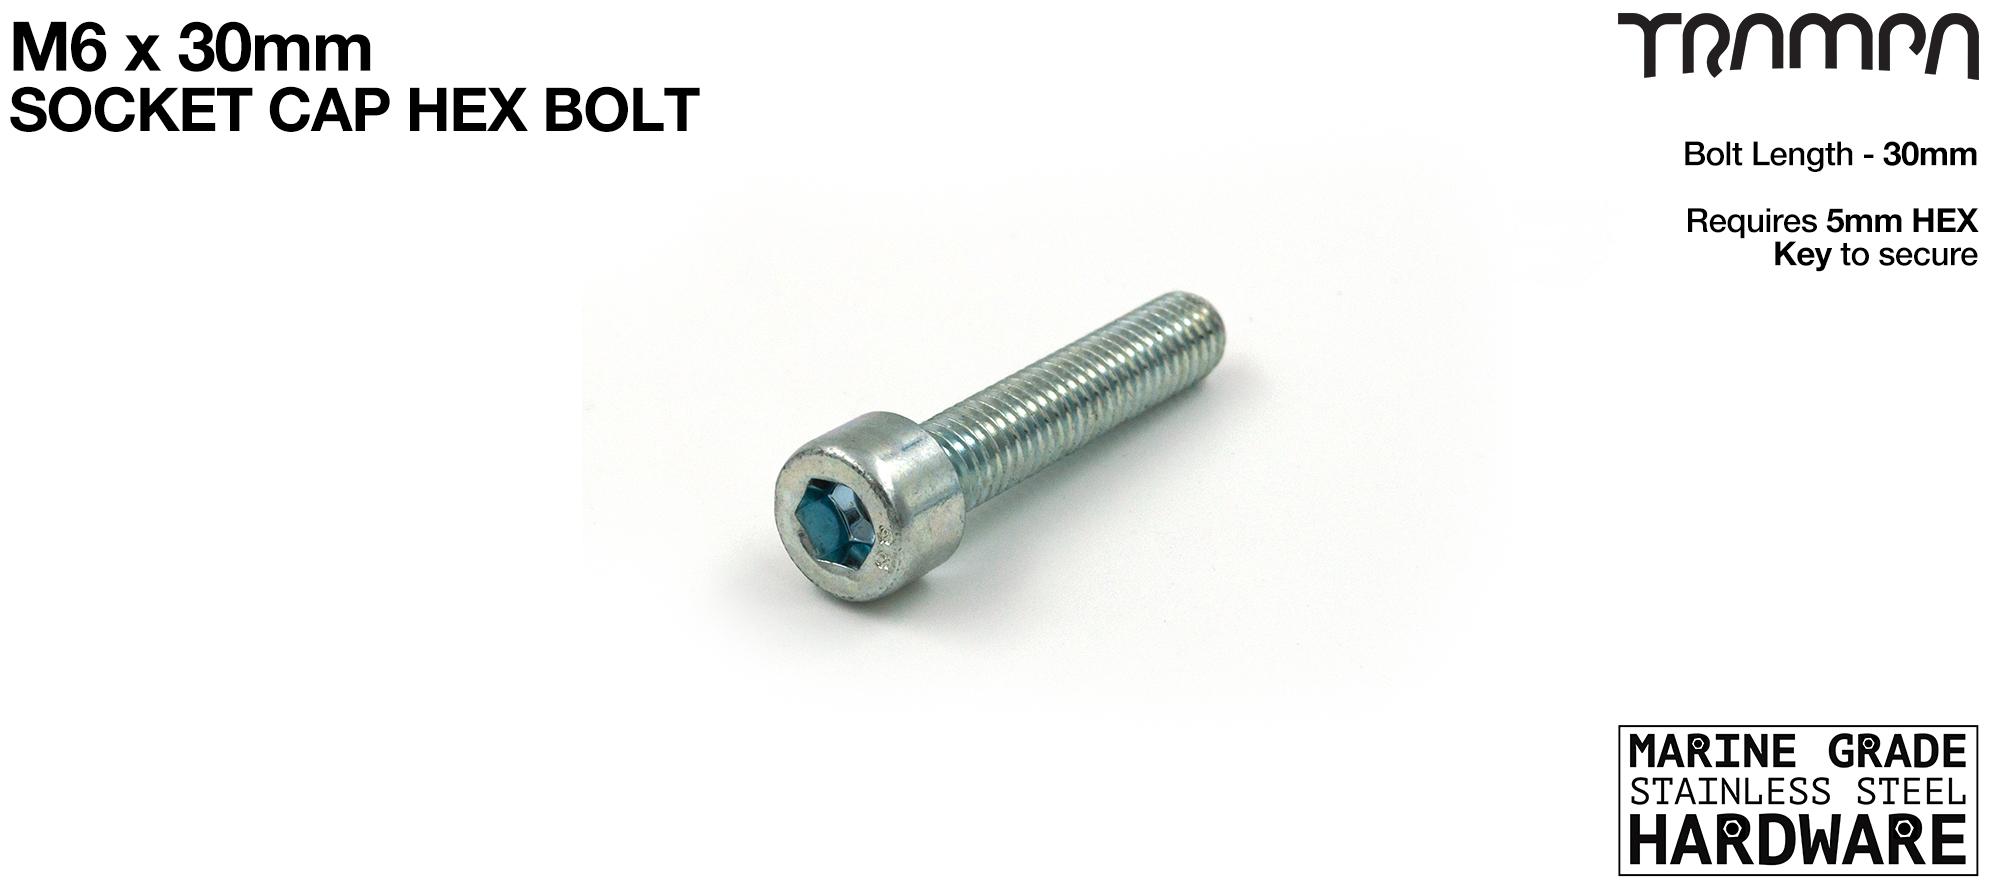 M6 x 30mm Socket Capped Bolt for primo hub - Marine Grade Stainless steel